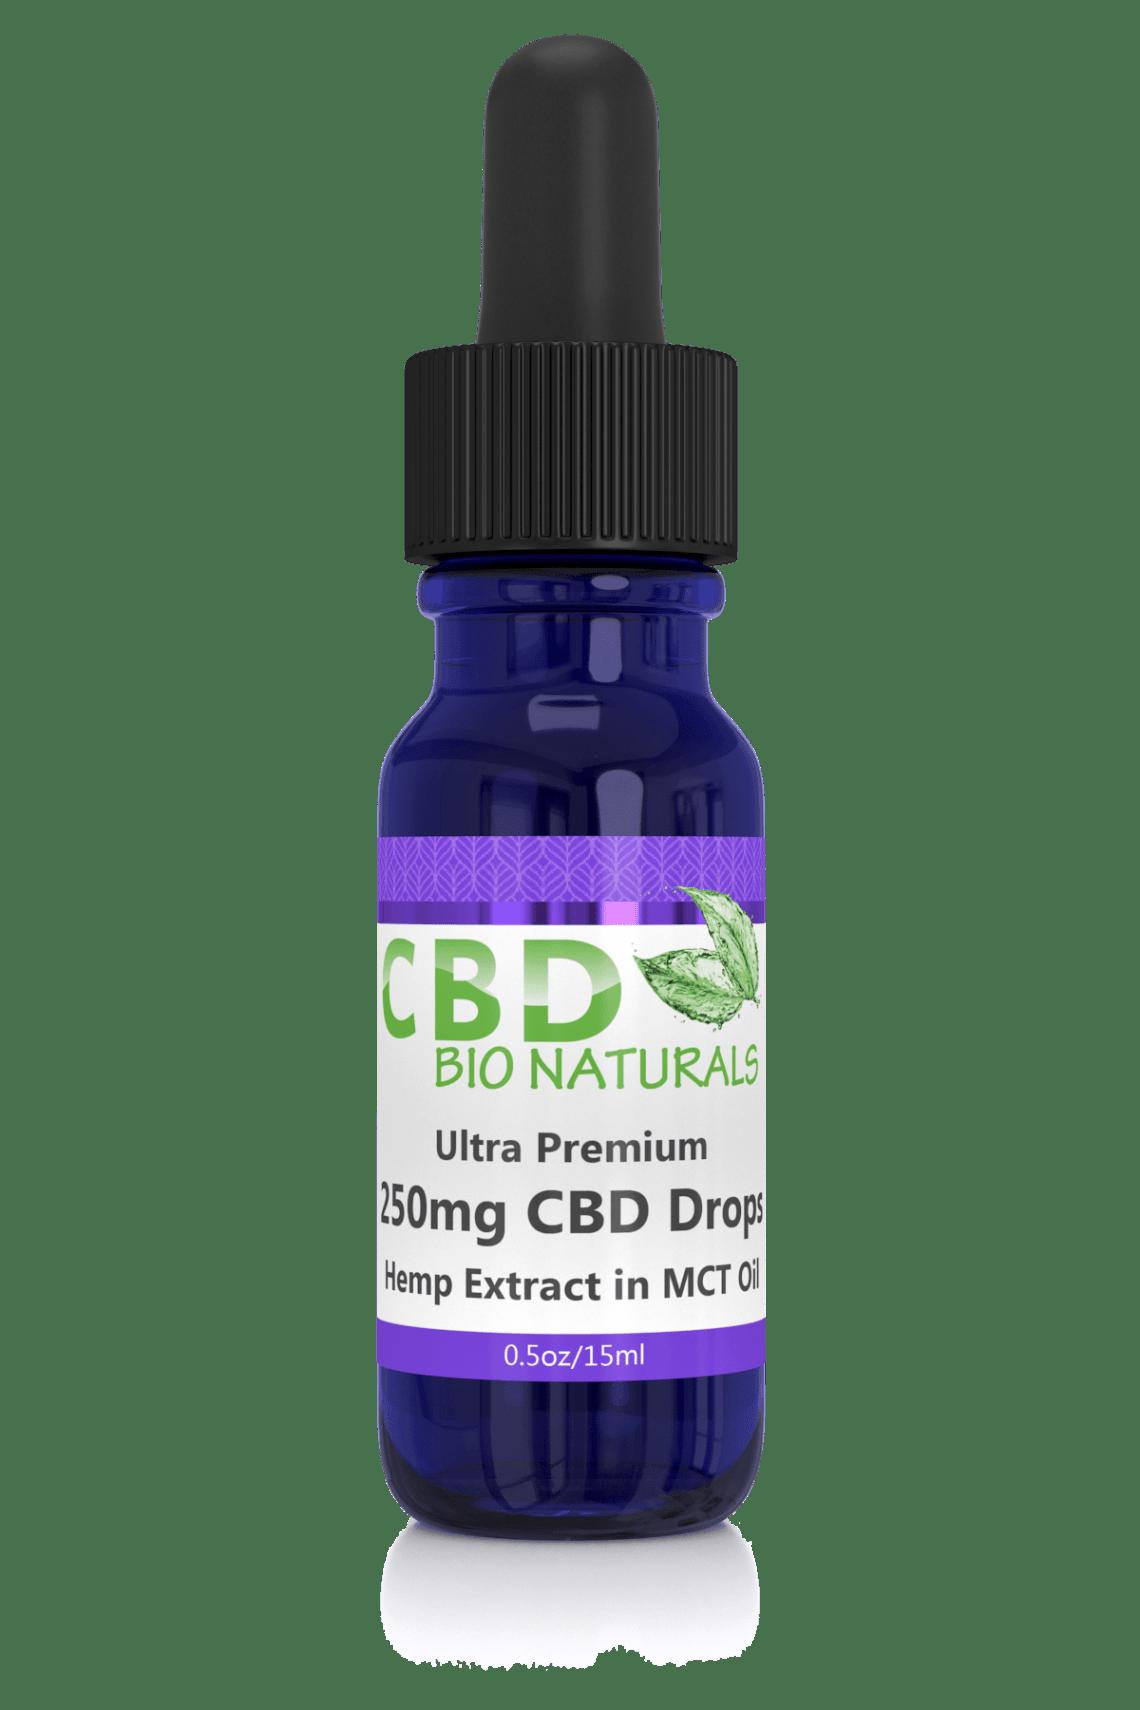 CBD for Anxiety & Depression – CBD Bio Naturals